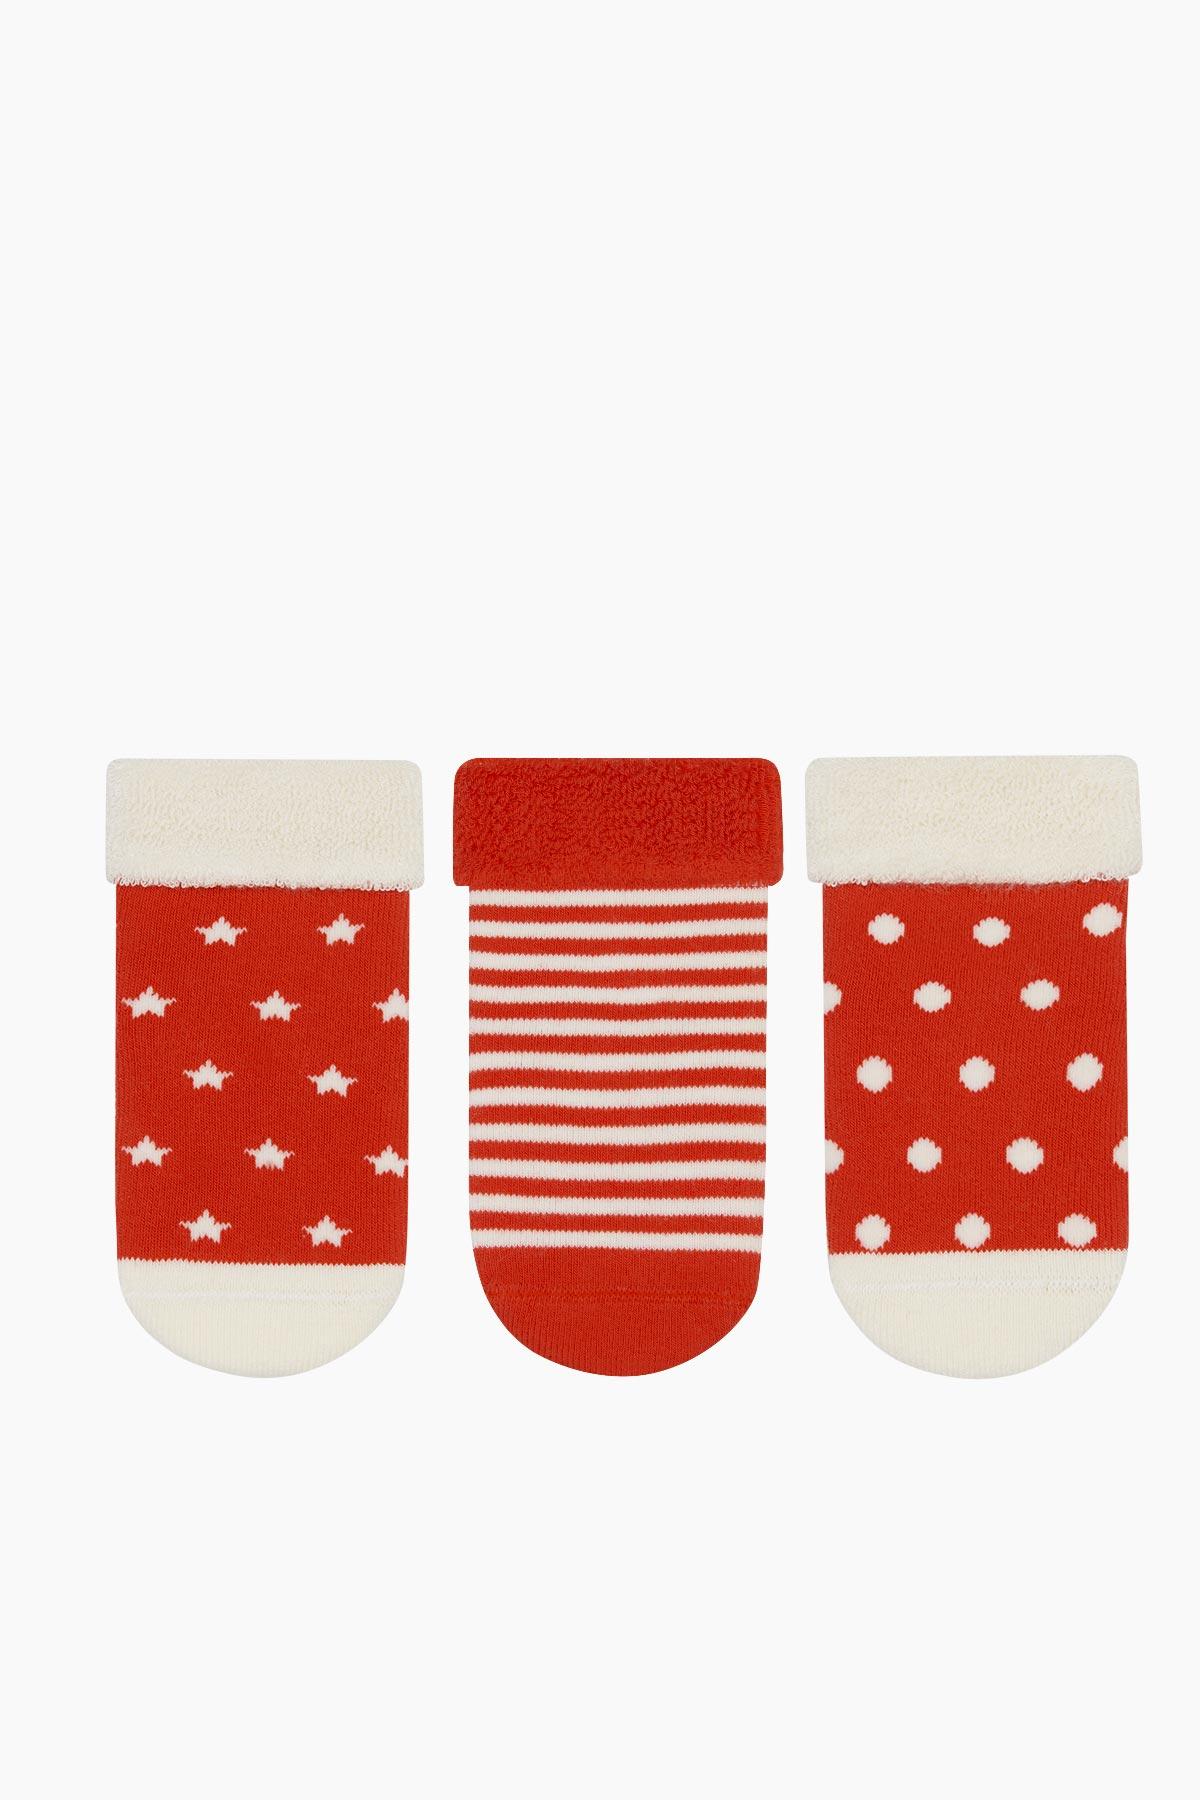 Bross - 3-pack Point Ring Pattern Antislip Printed Baby Terry Socks